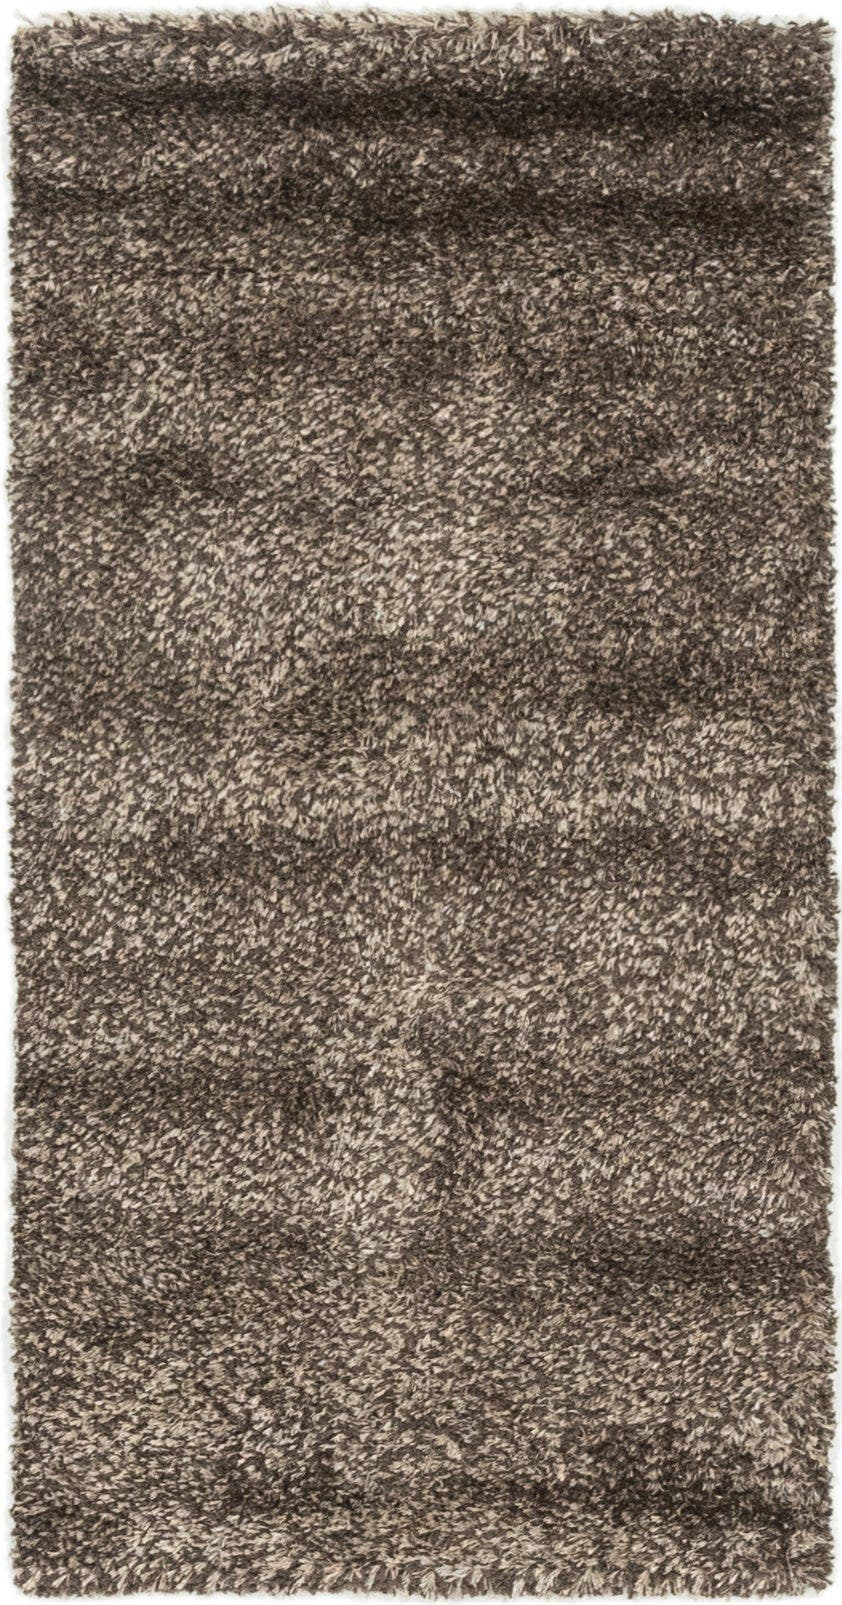 2' 3 x 4' 4 Textured Shag Rug main image